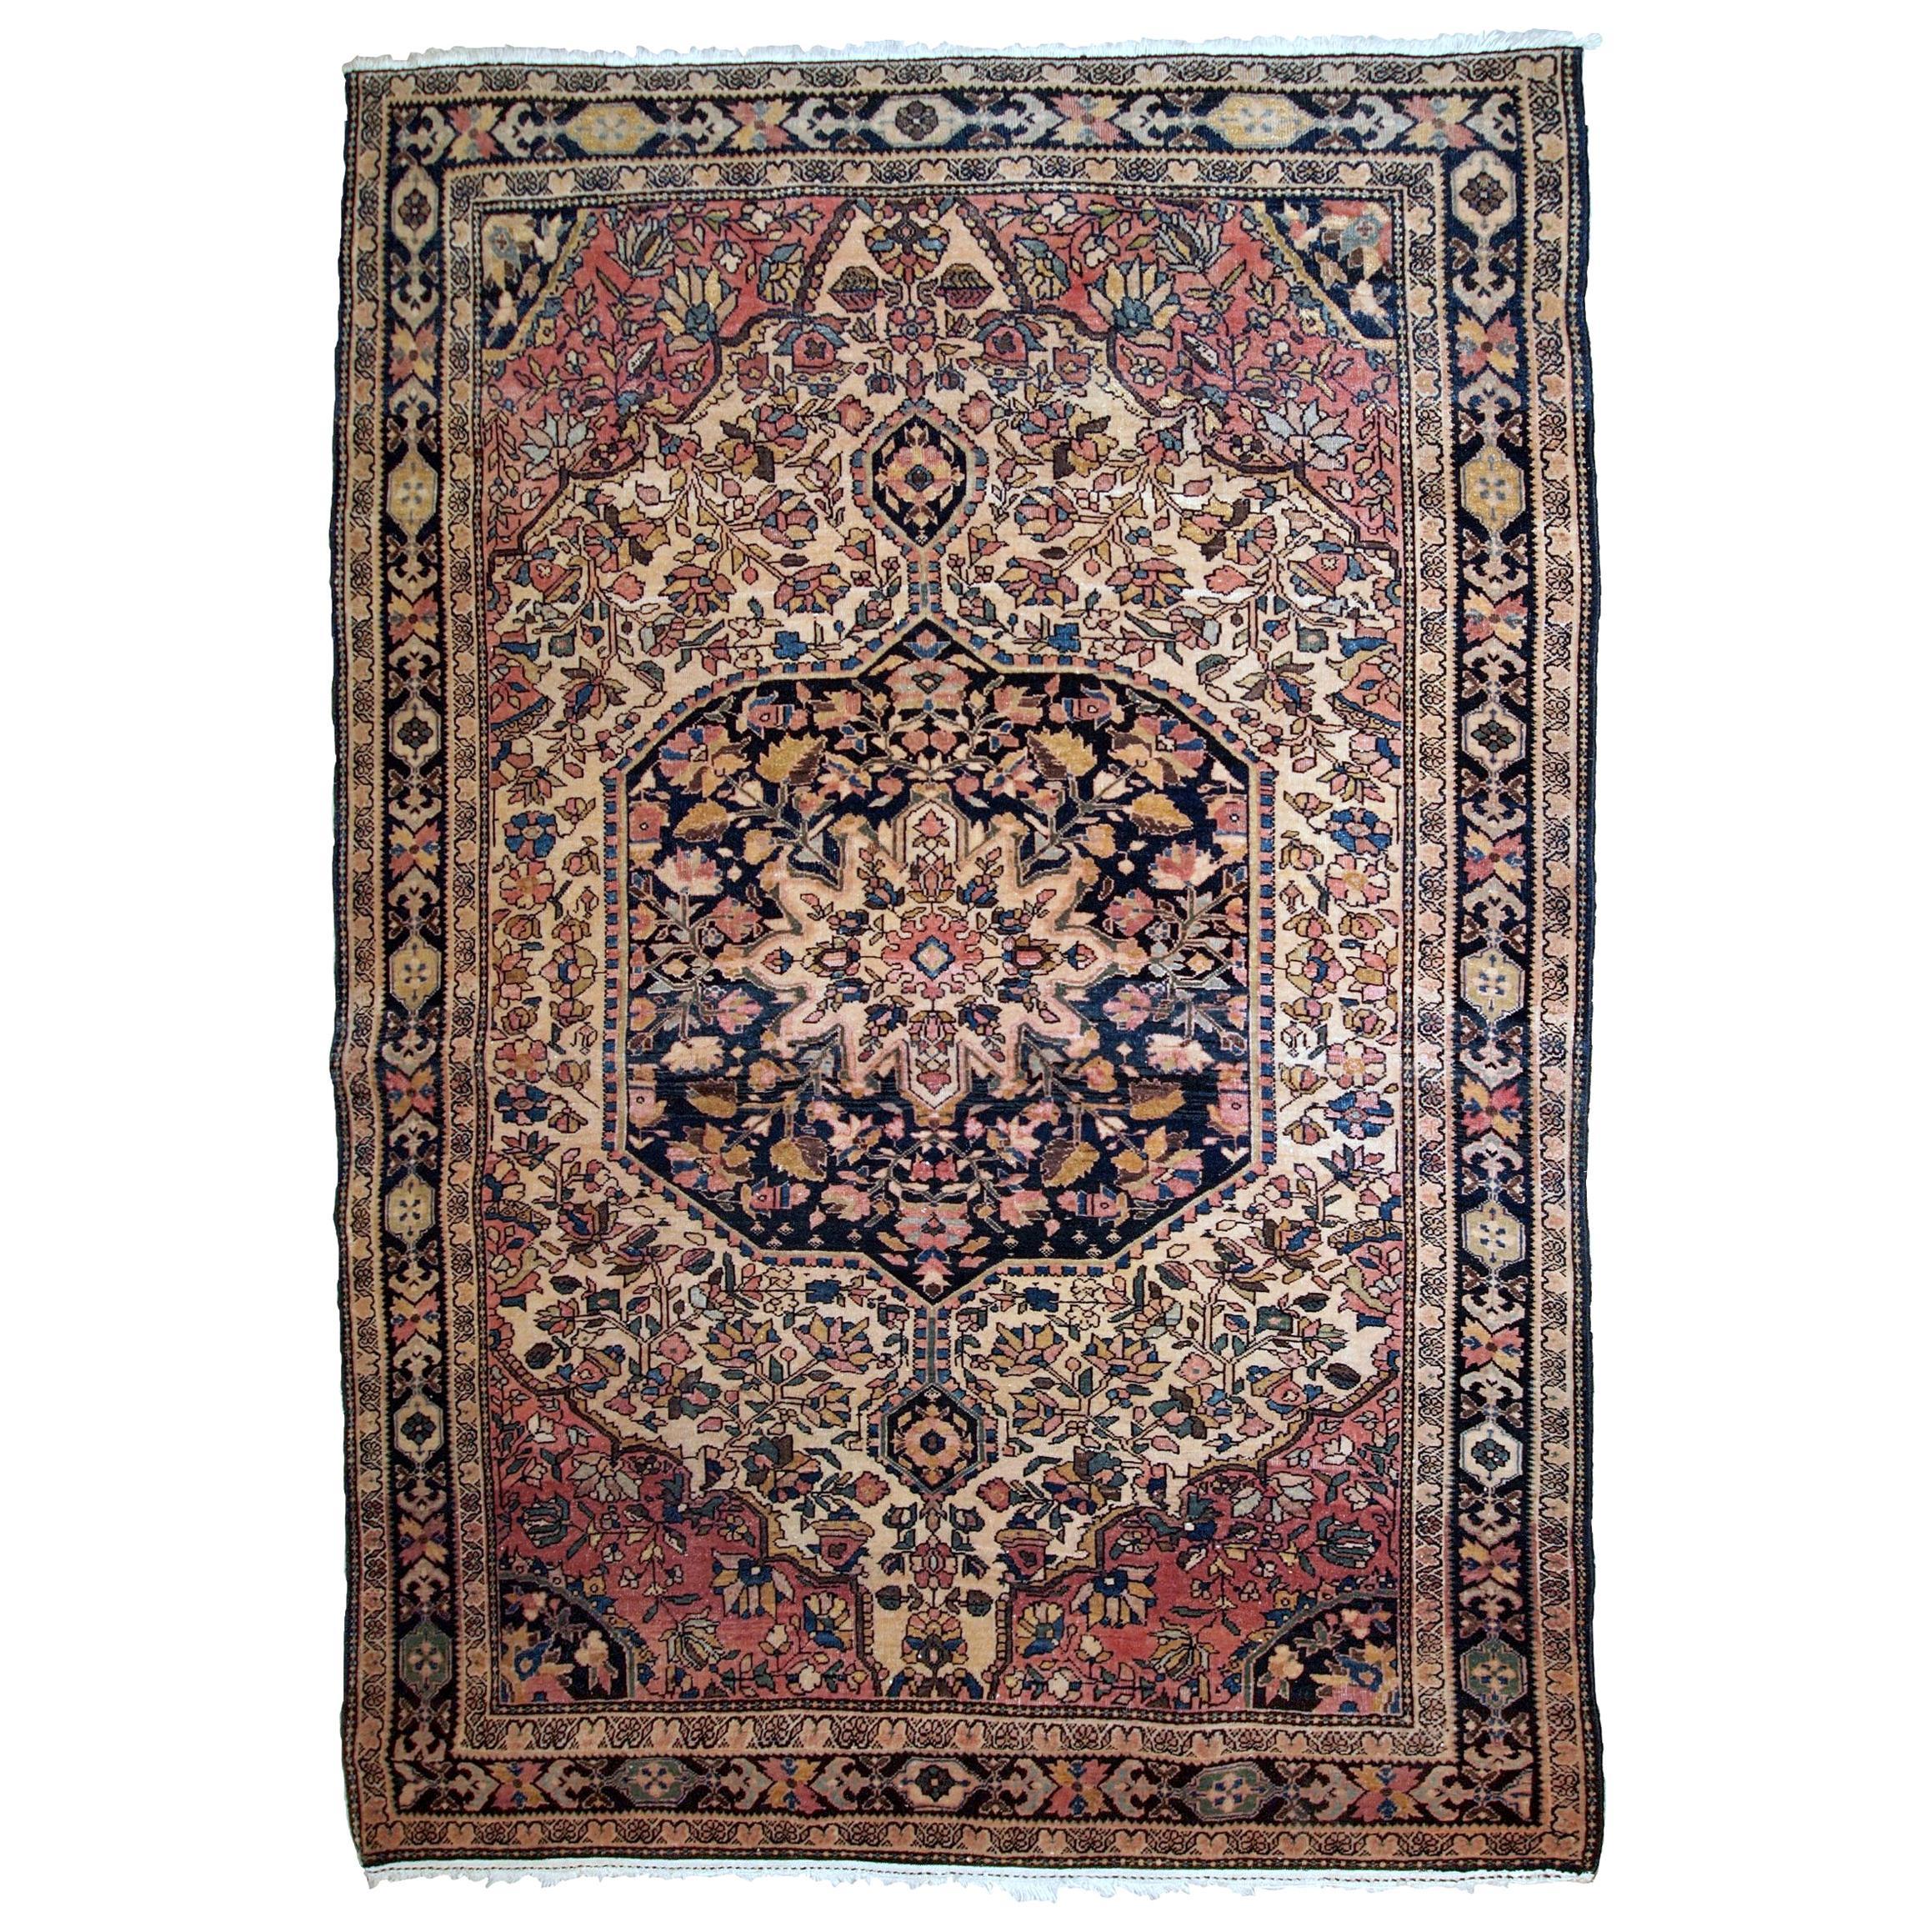 Handmade Antique Sarouk Farahan Style Rug, 1900s, 1B793